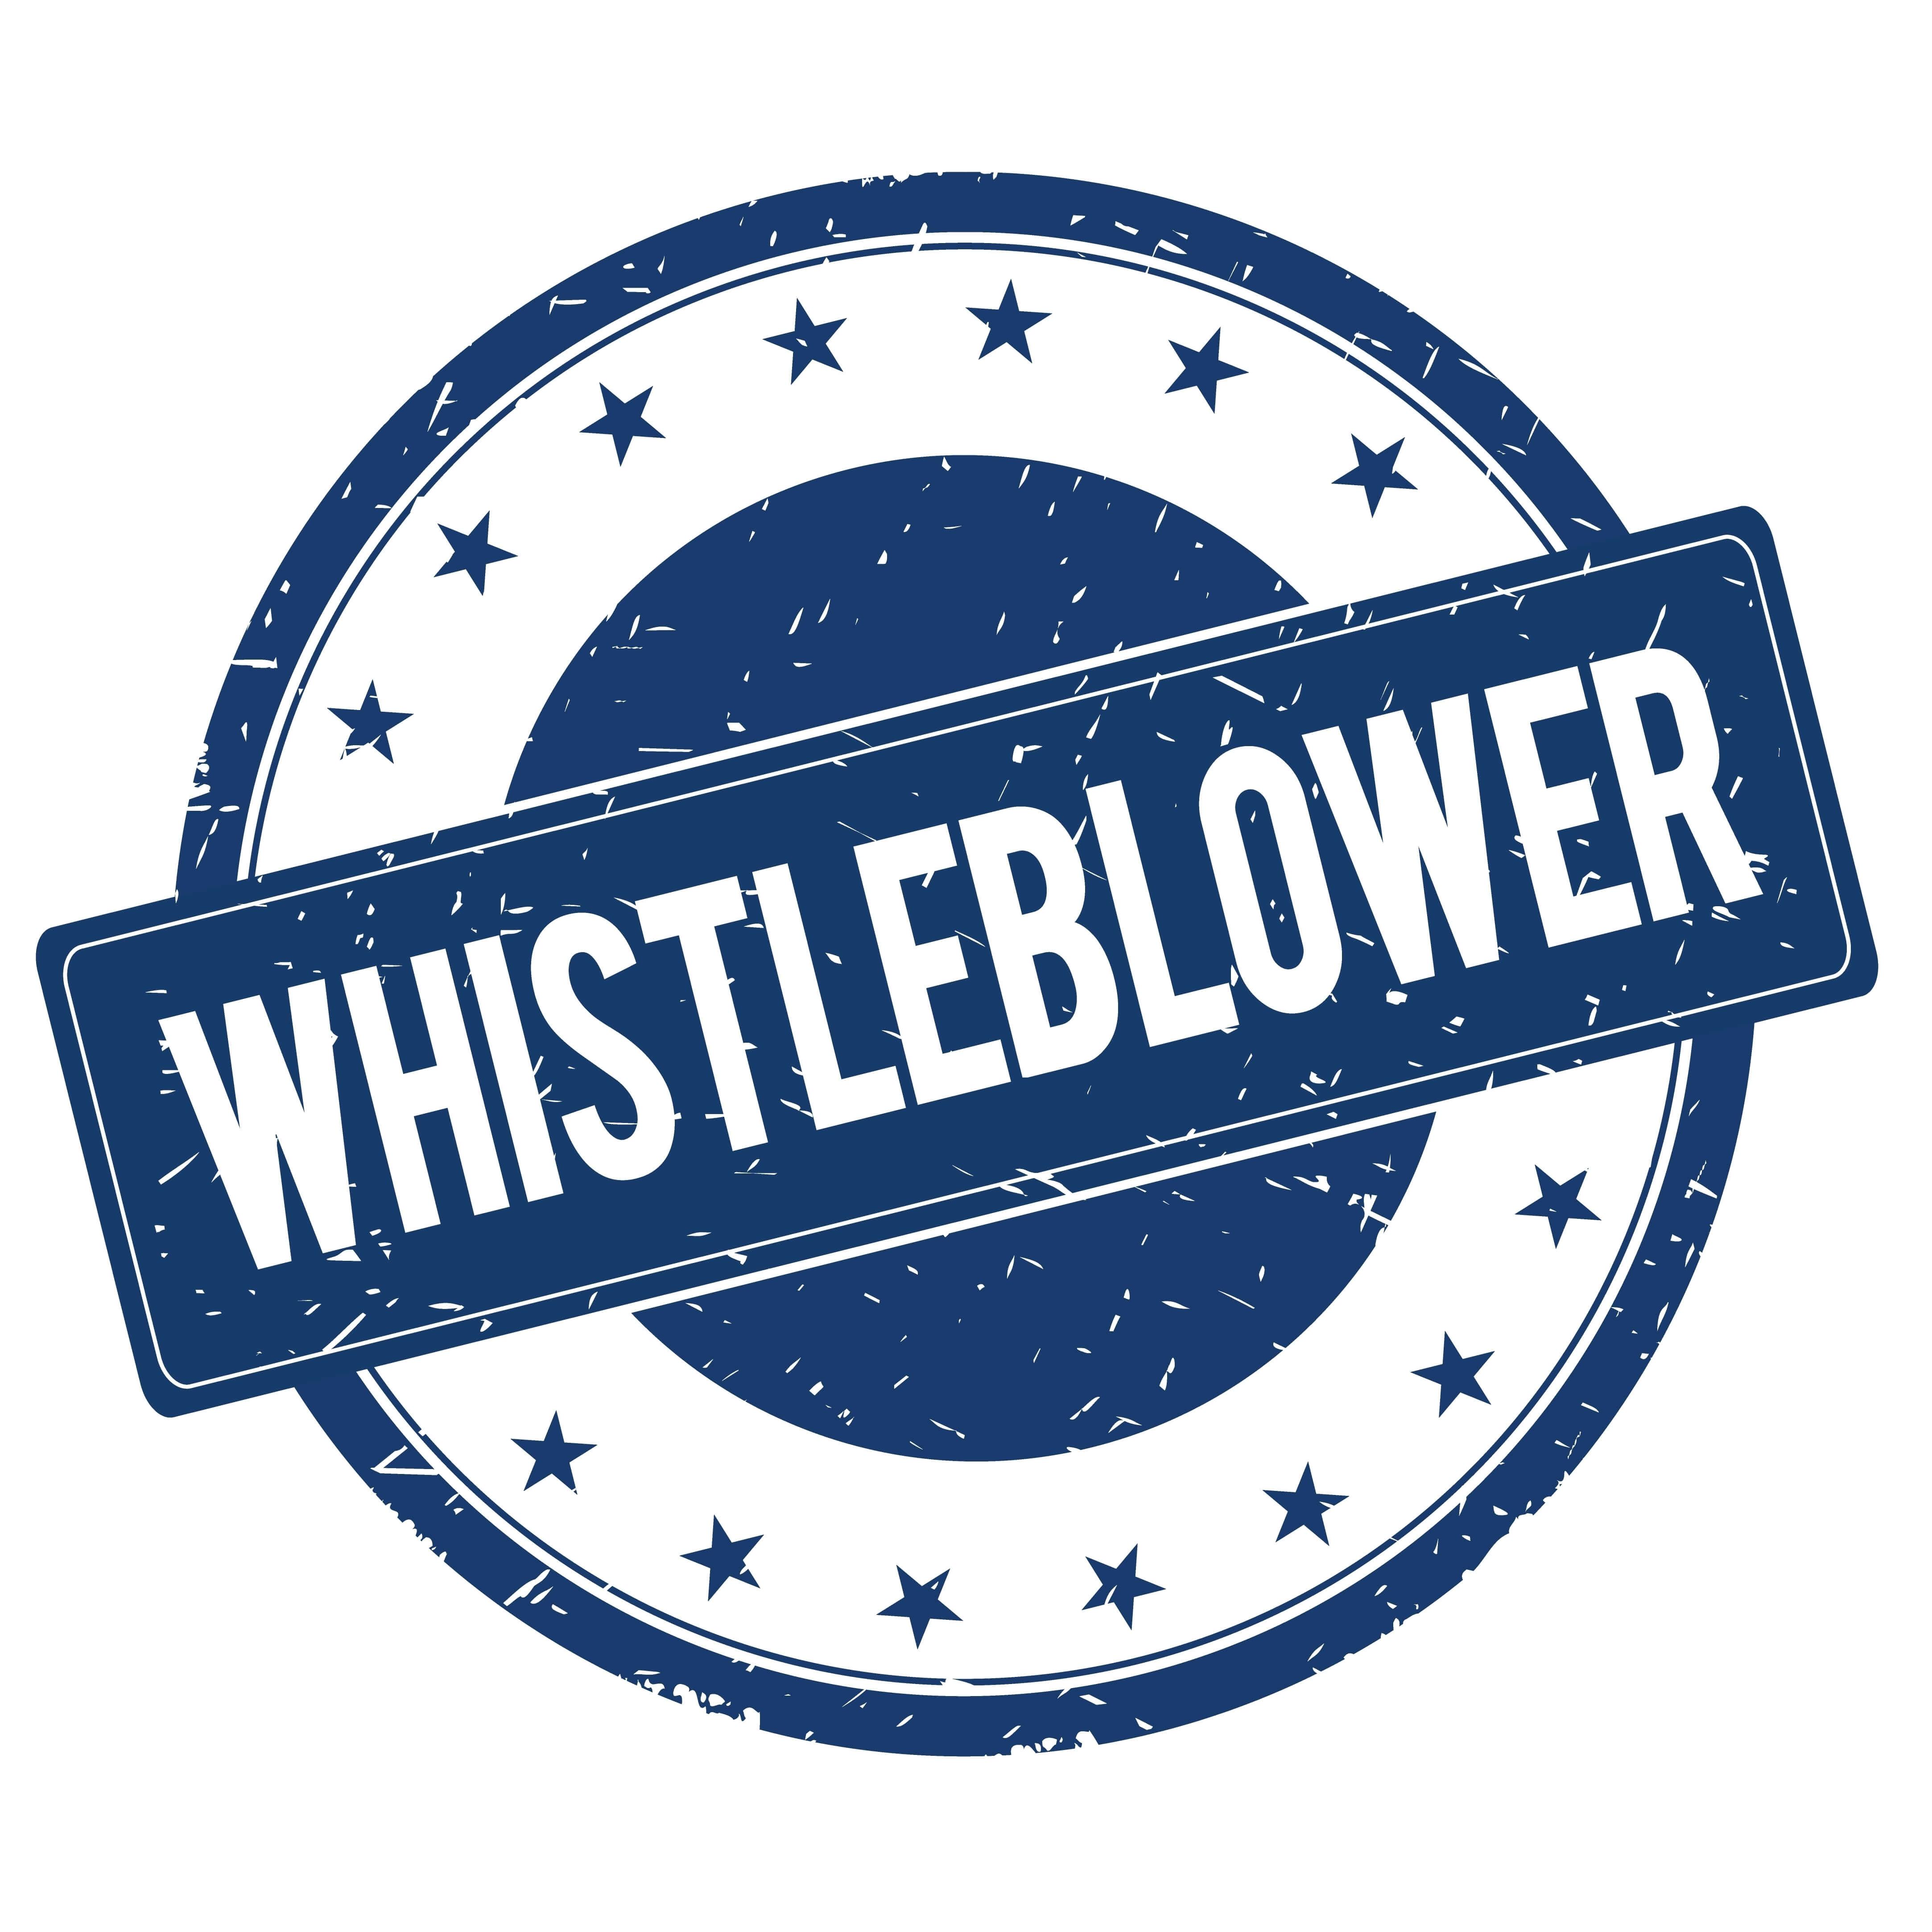 4332x4332 Top 10 Whistleblower Successes For 2016